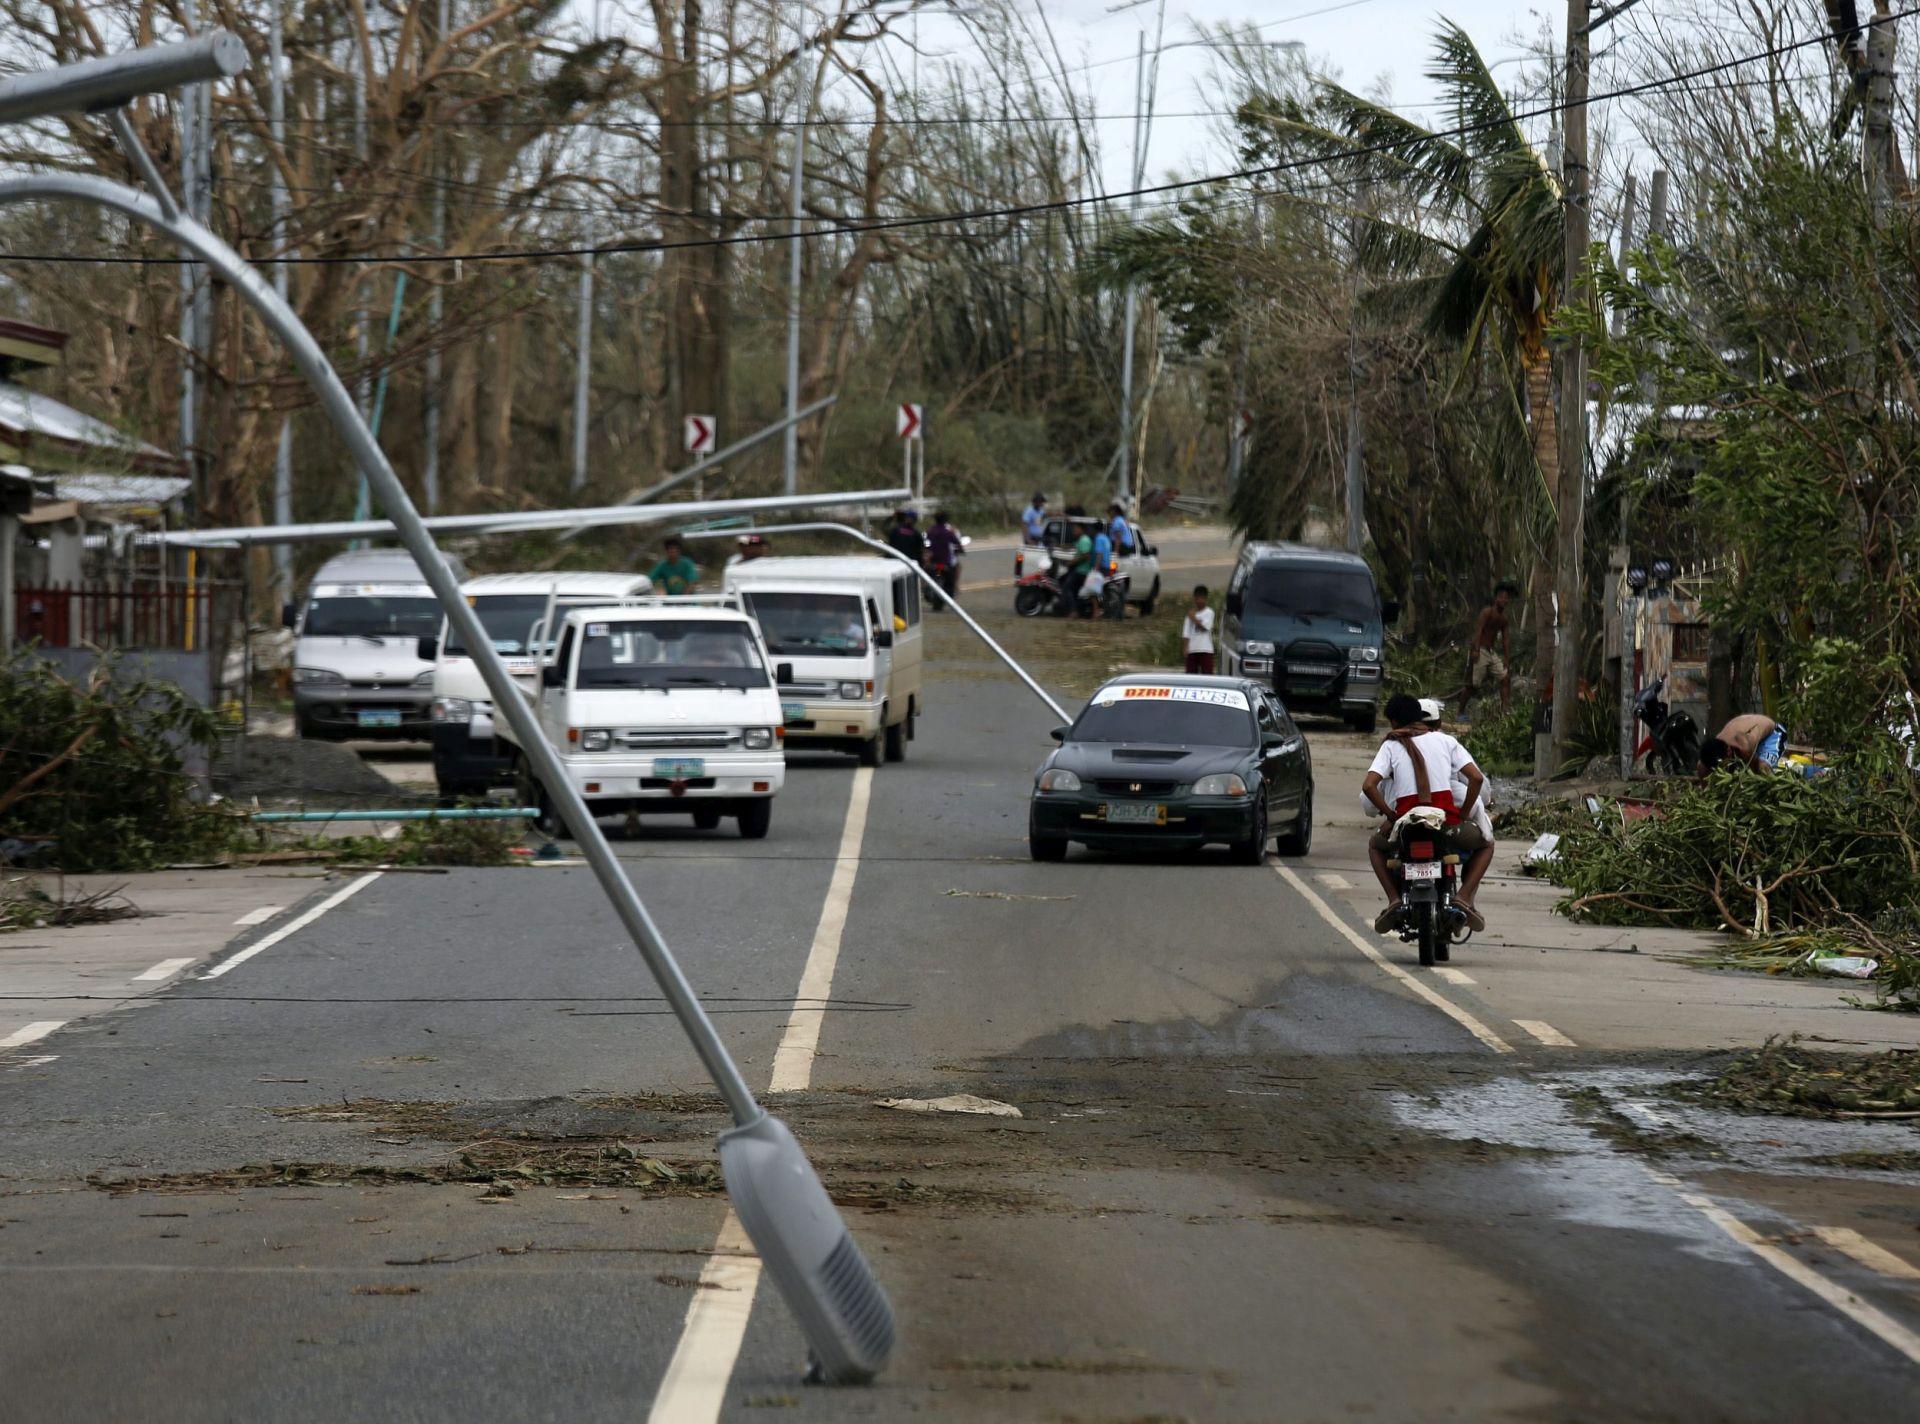 Filipini: 19 mrtvih u udesu autobusa